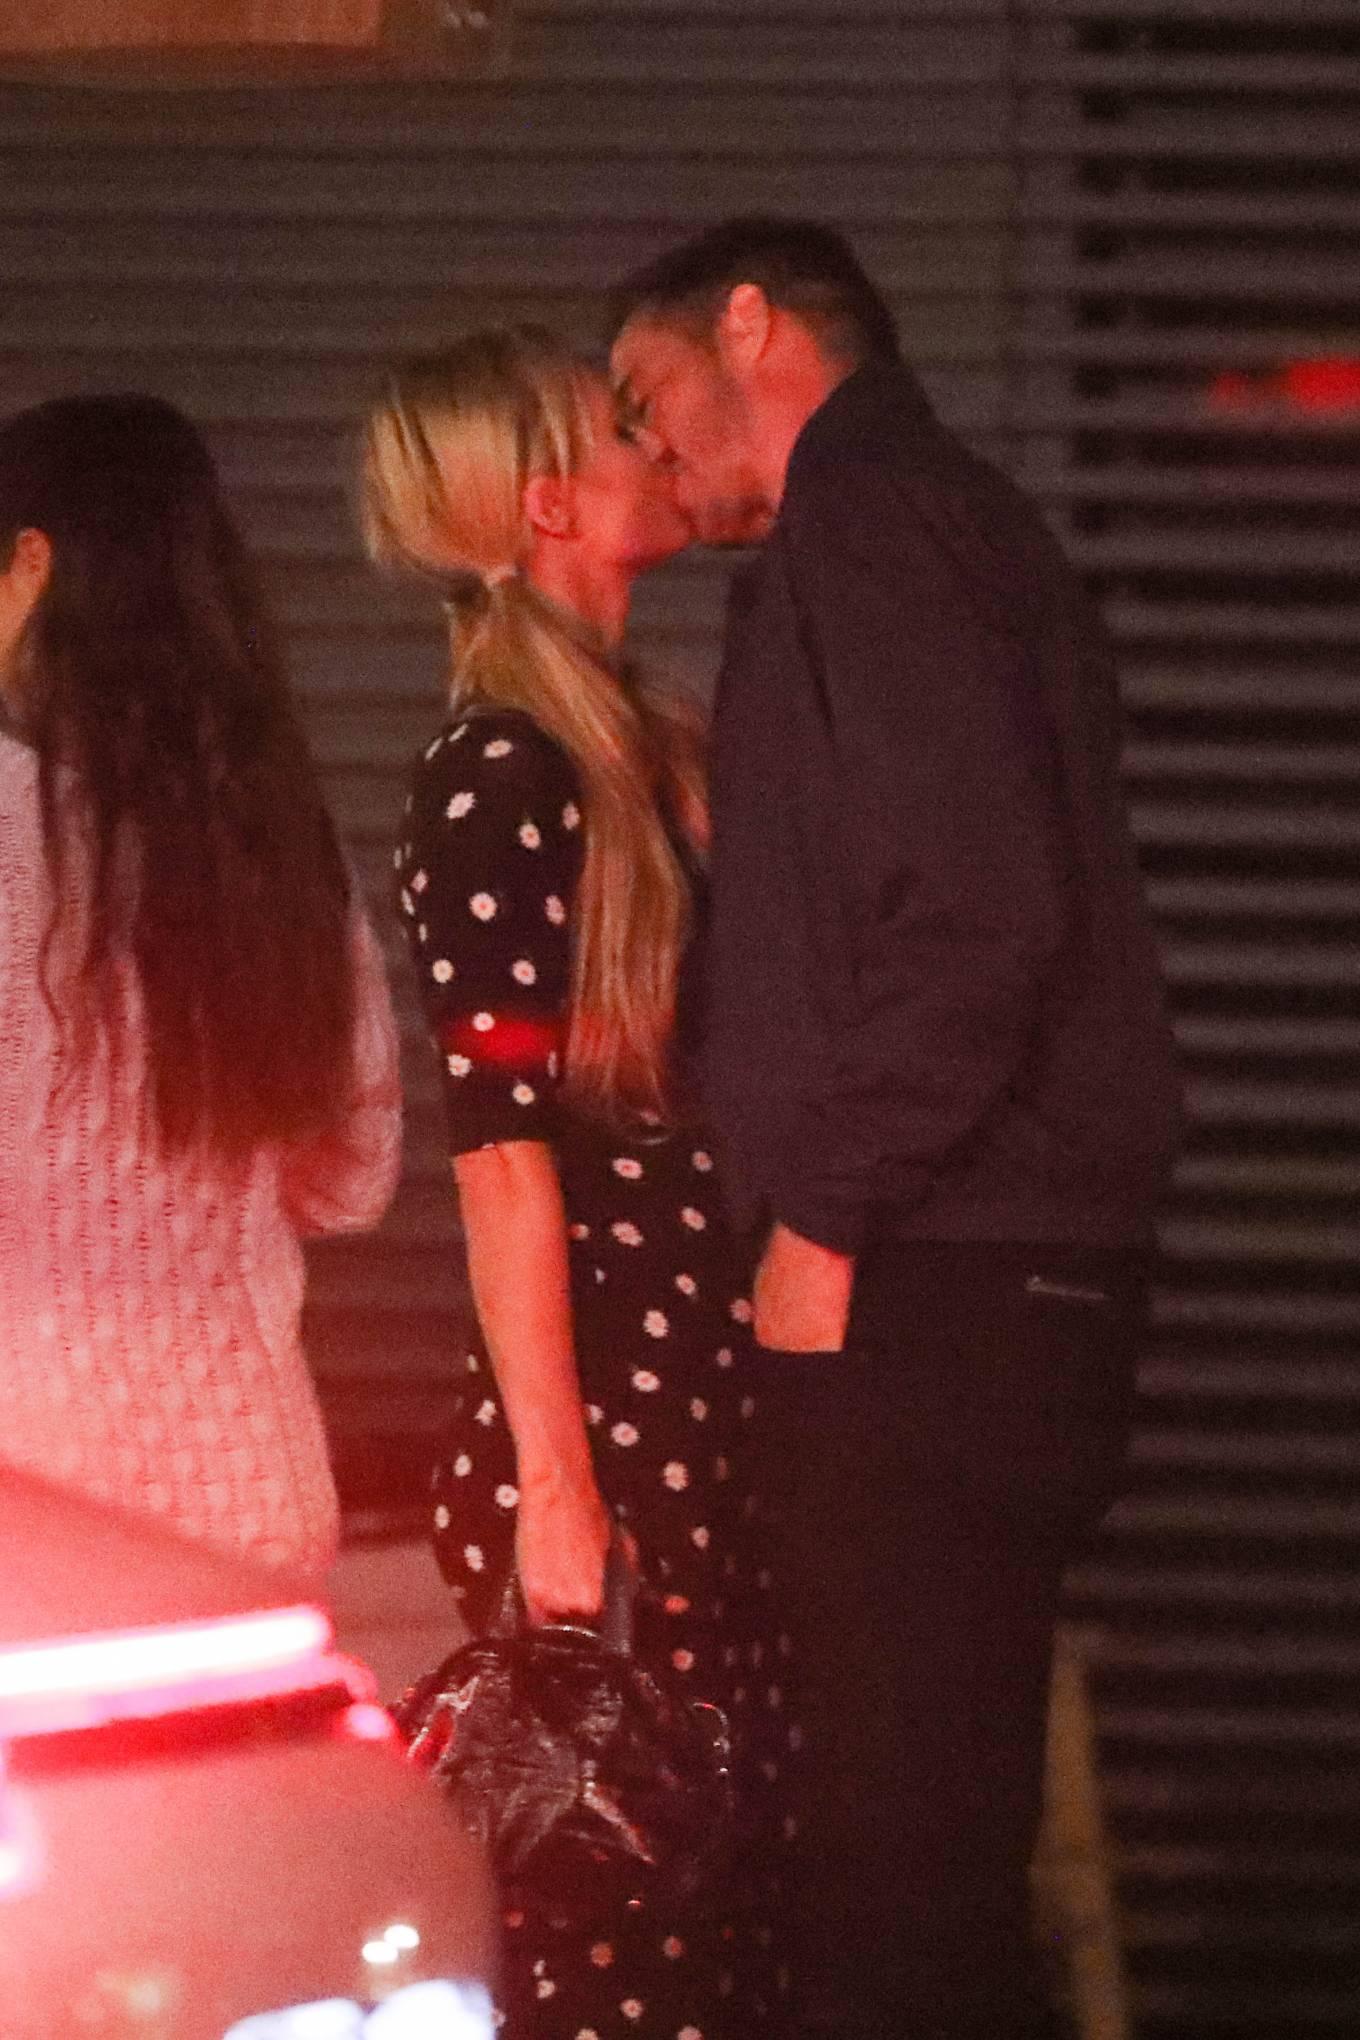 Paris Hilton and Carter Reum - Out at dinner at Nobu in Malibu